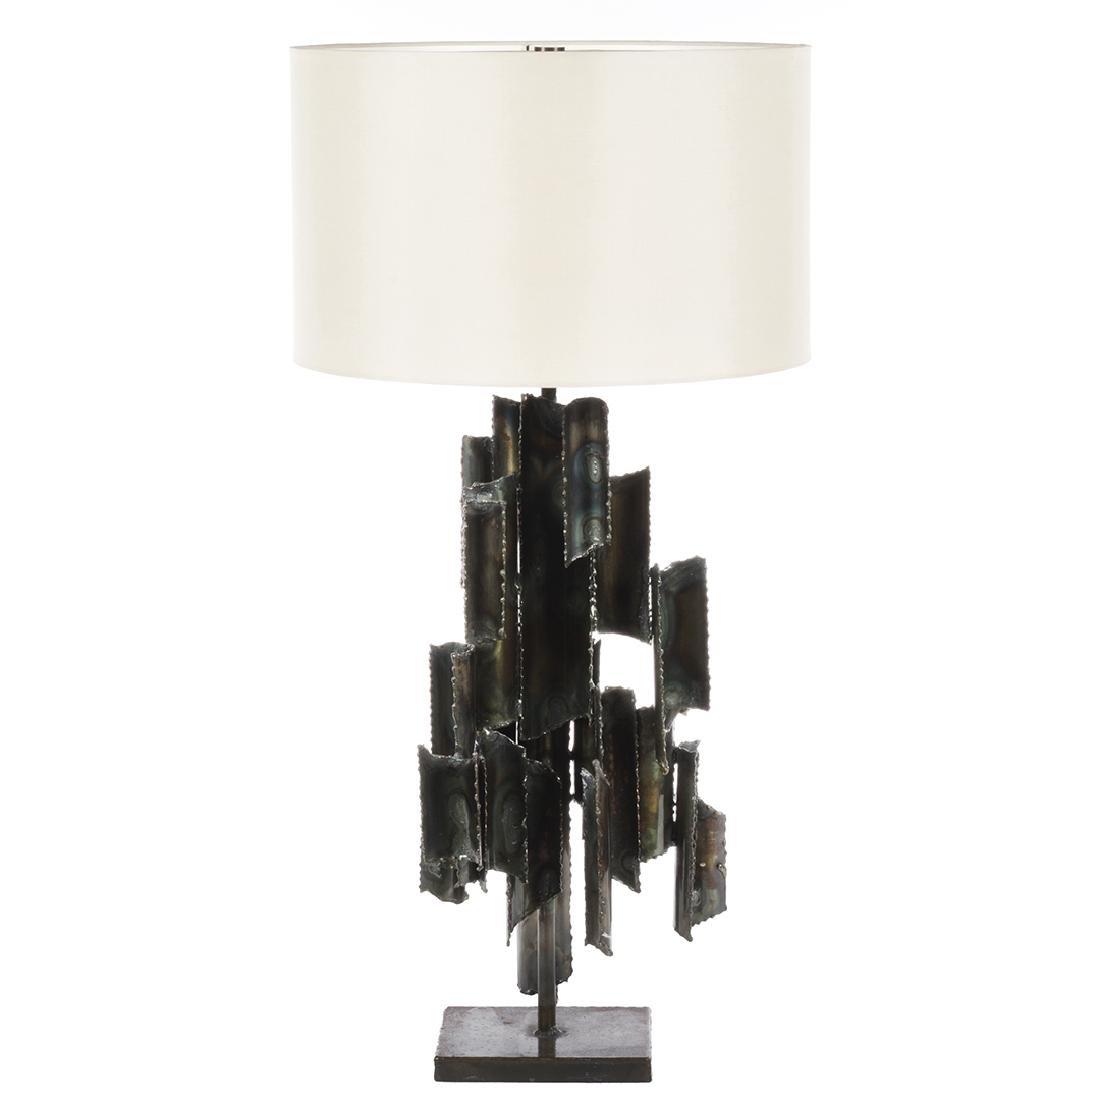 Marcello Fantoni Studio Burnished Metal Table Lamp - 2